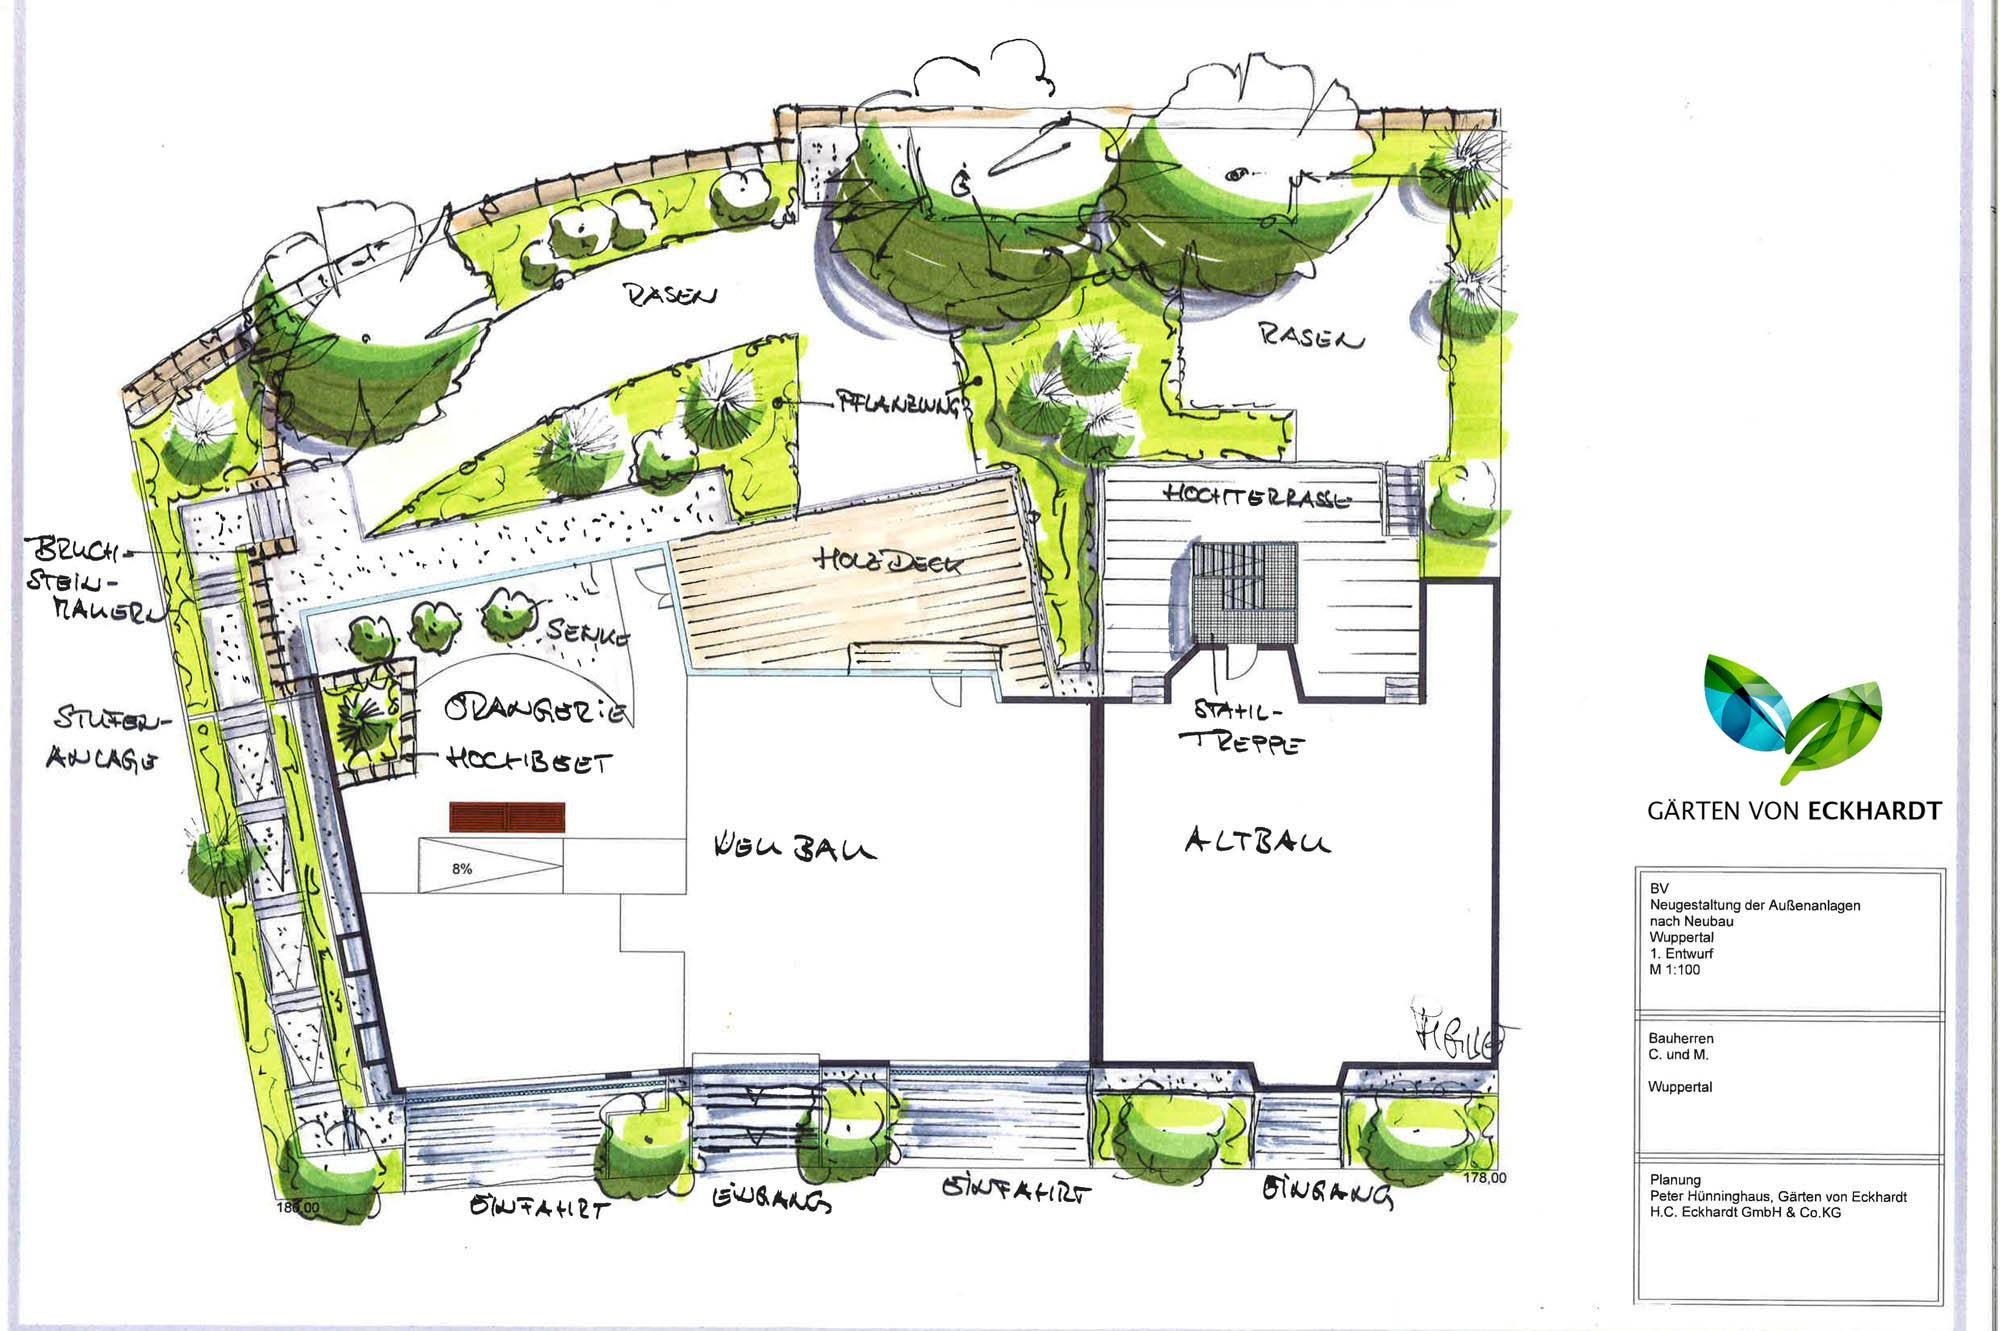 gartenplanung beratung h c eckhardt gmbh co kg. Black Bedroom Furniture Sets. Home Design Ideas